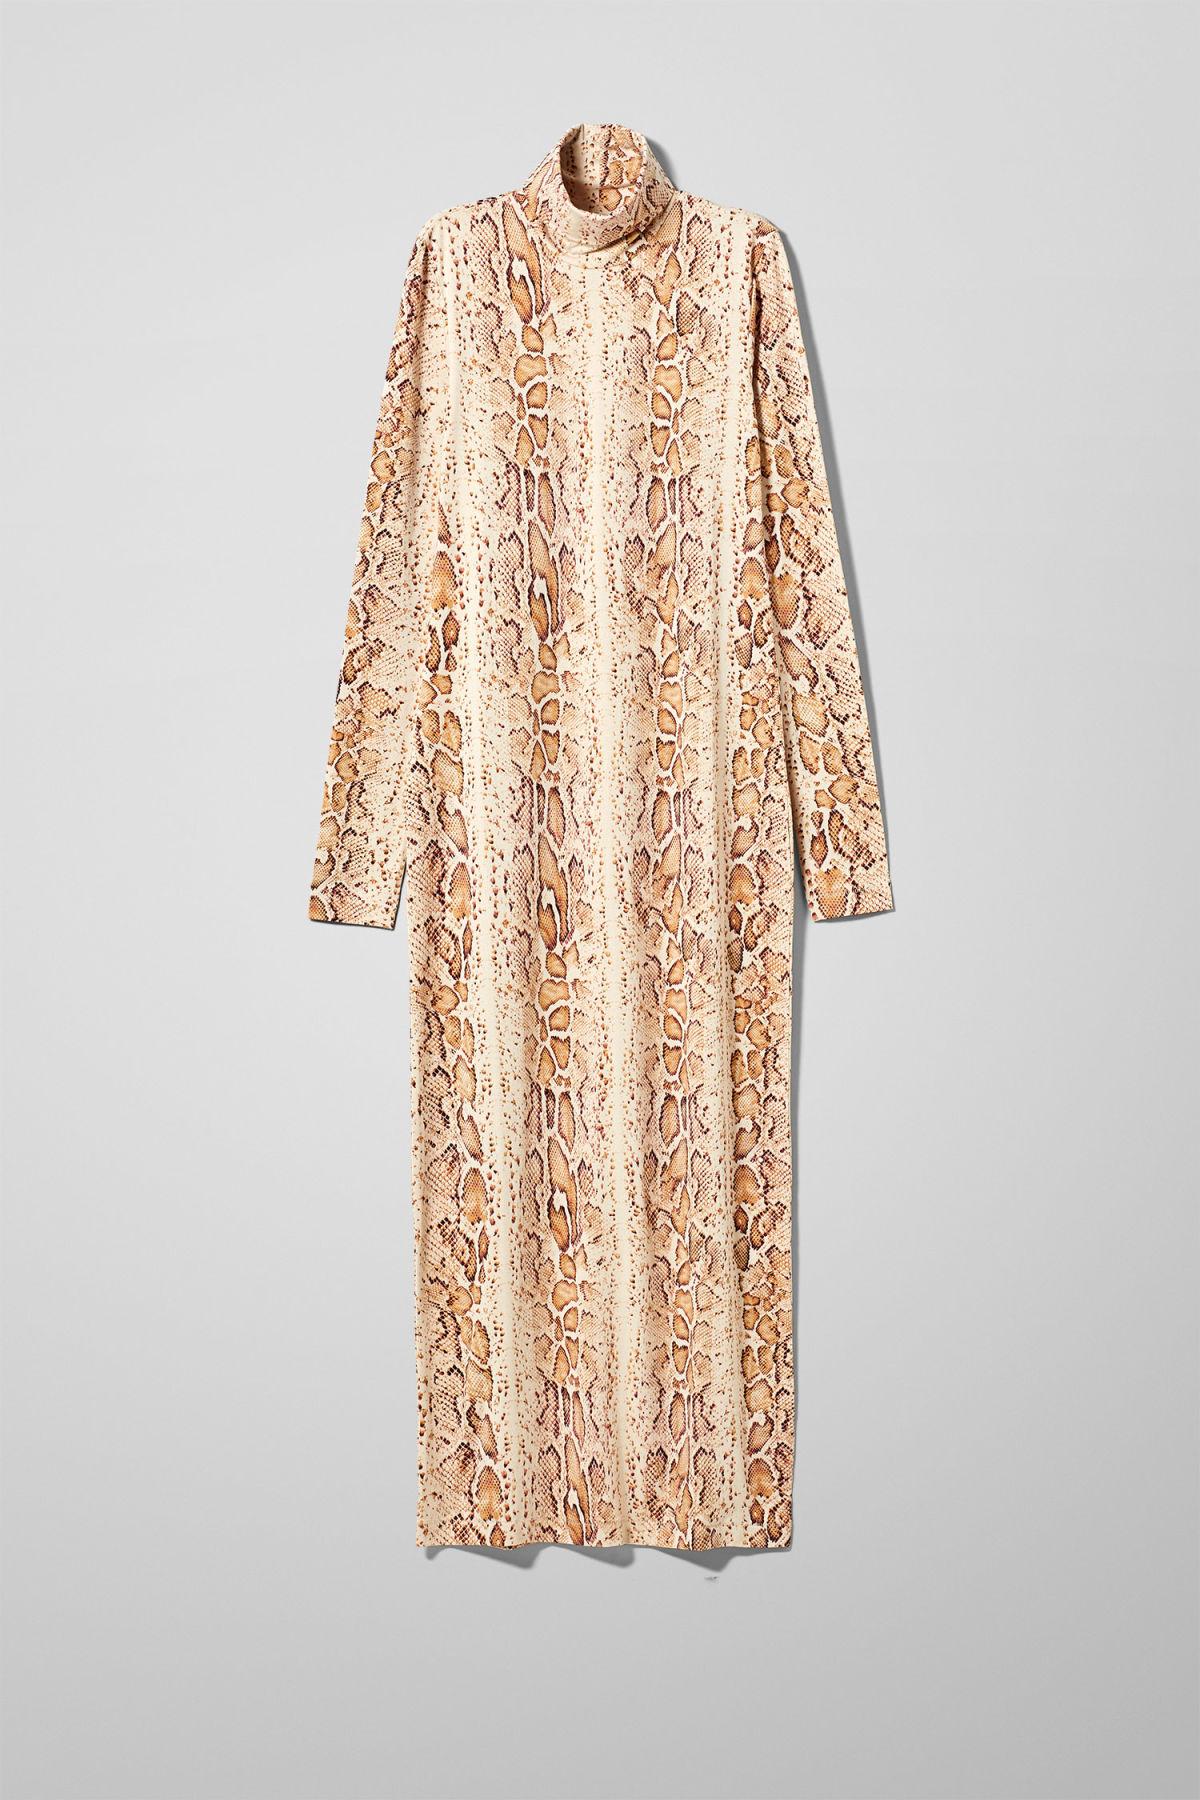 Image of Maxine Dress - Beige-XS